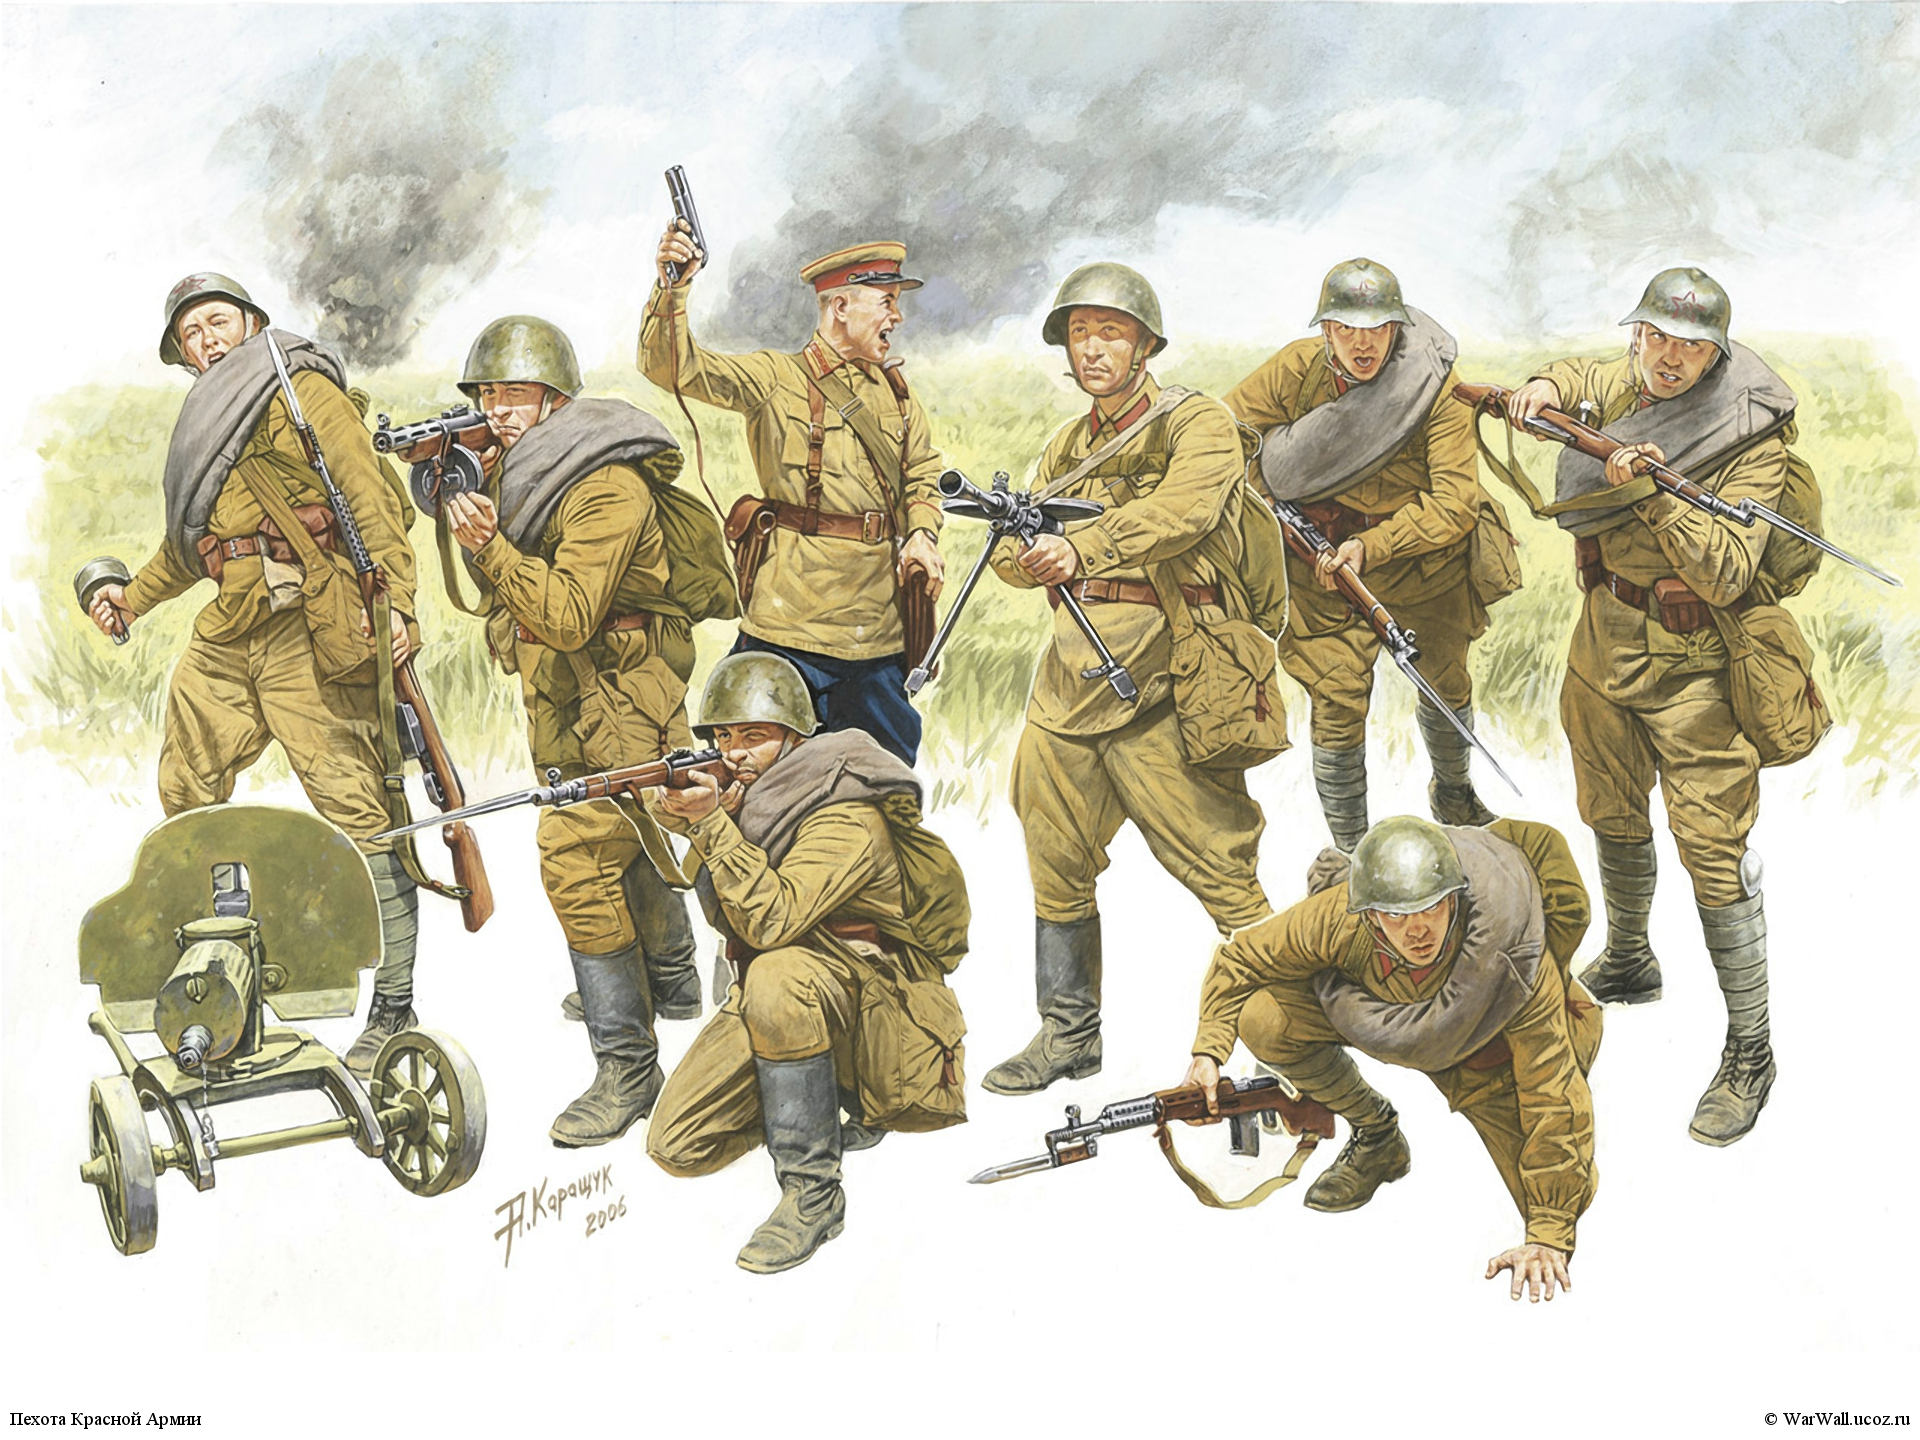 Всего у нас в галерее 3464 рисунков и ещё ...: warwall.ru/photo/warwall/zvezda/3526_pekhota_krasnoj_armii/10-0-653